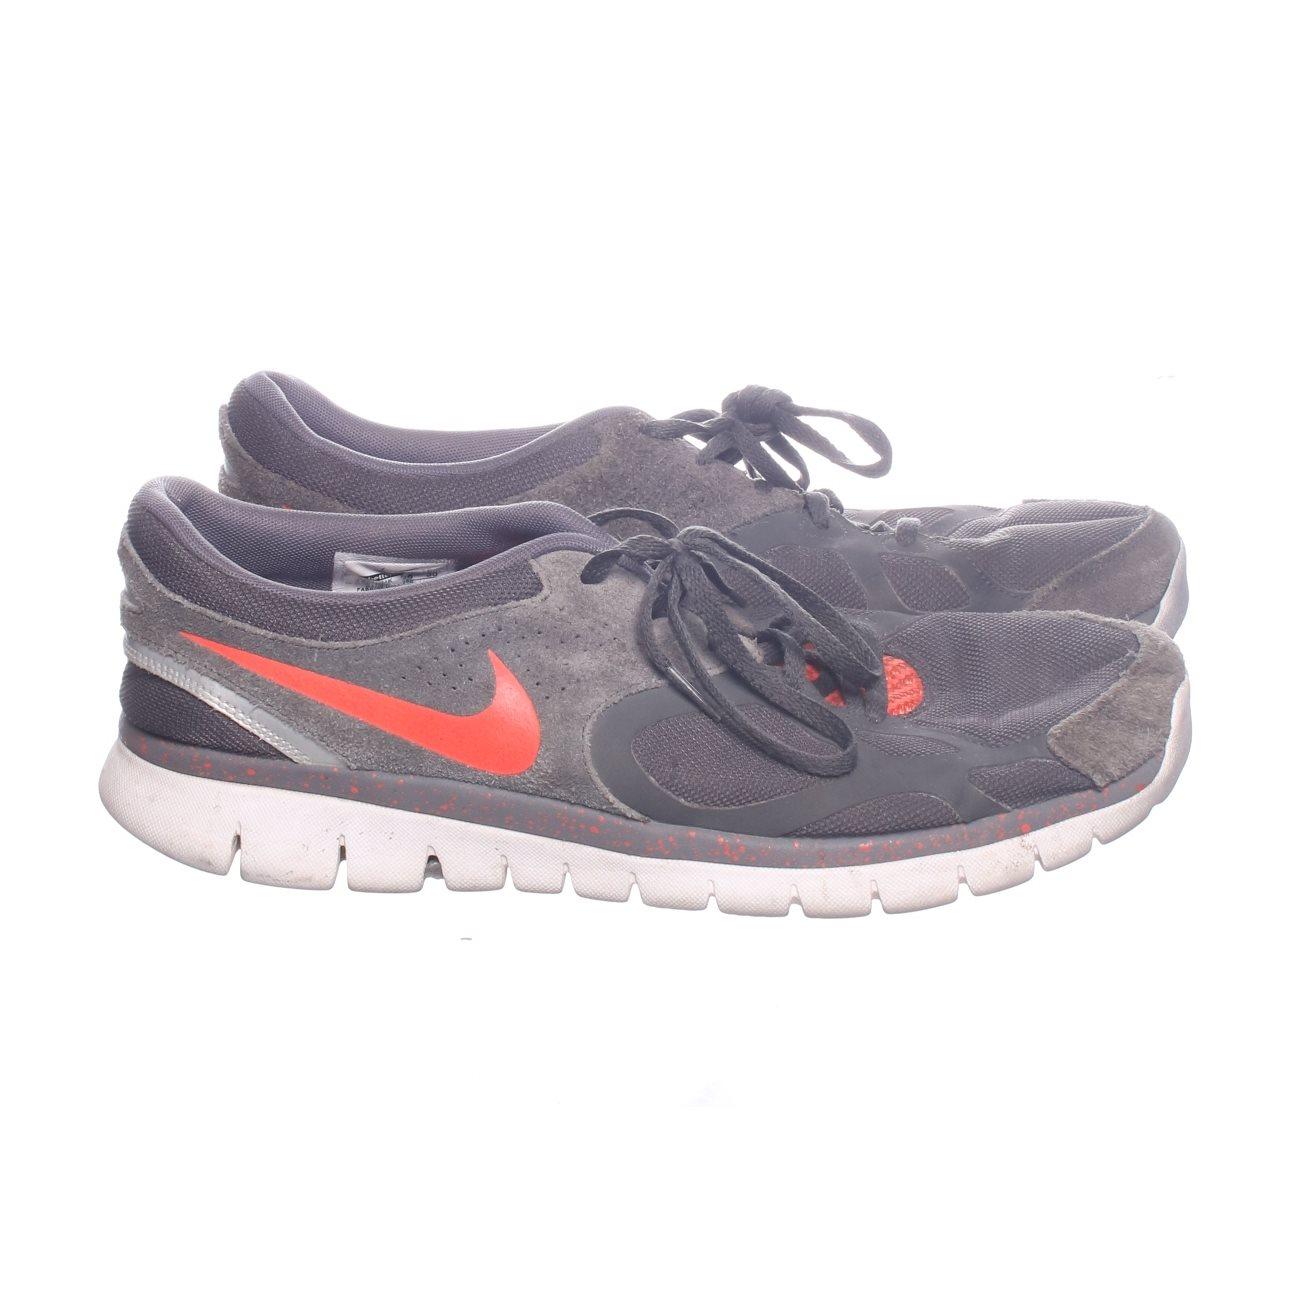 purchase cheap aad5b d3e73 Nike, Löparskor, Strl  46, Swoosh, Grå Röd